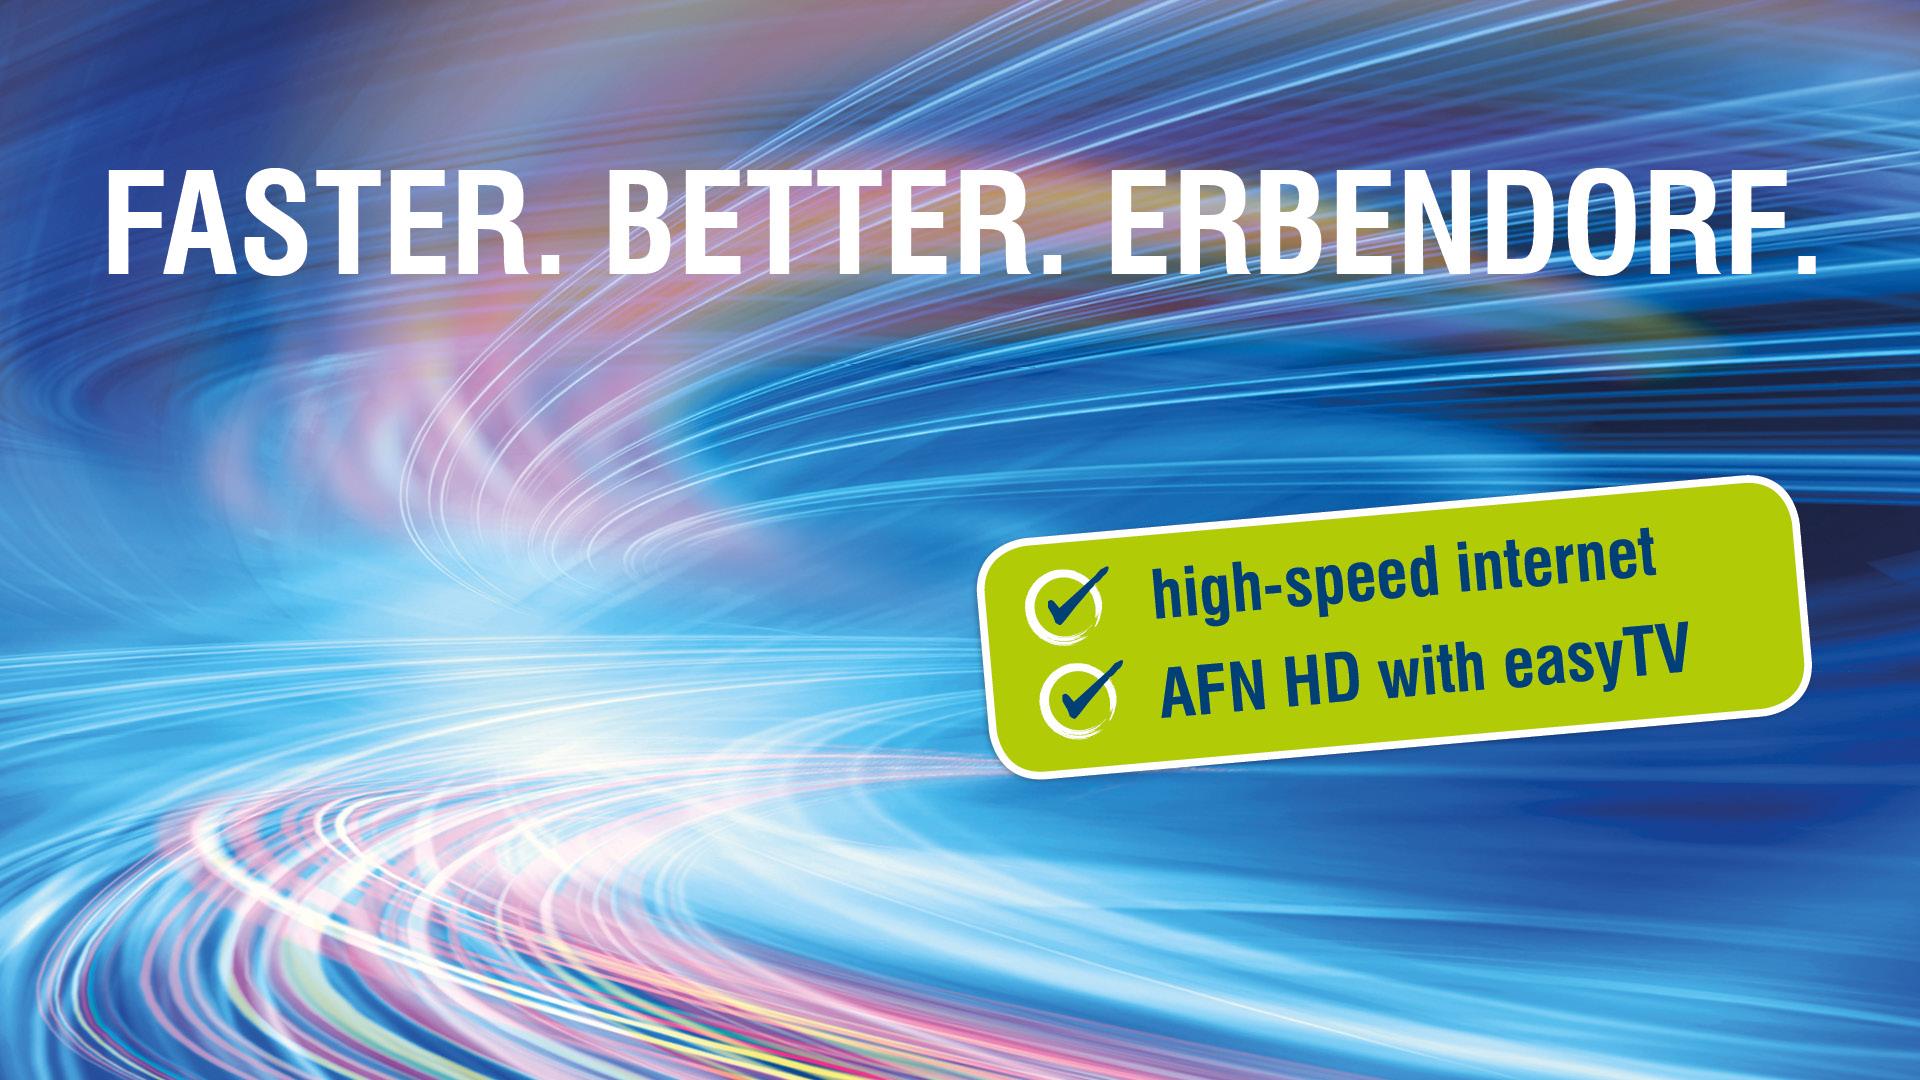 Erbendorf network upgrade